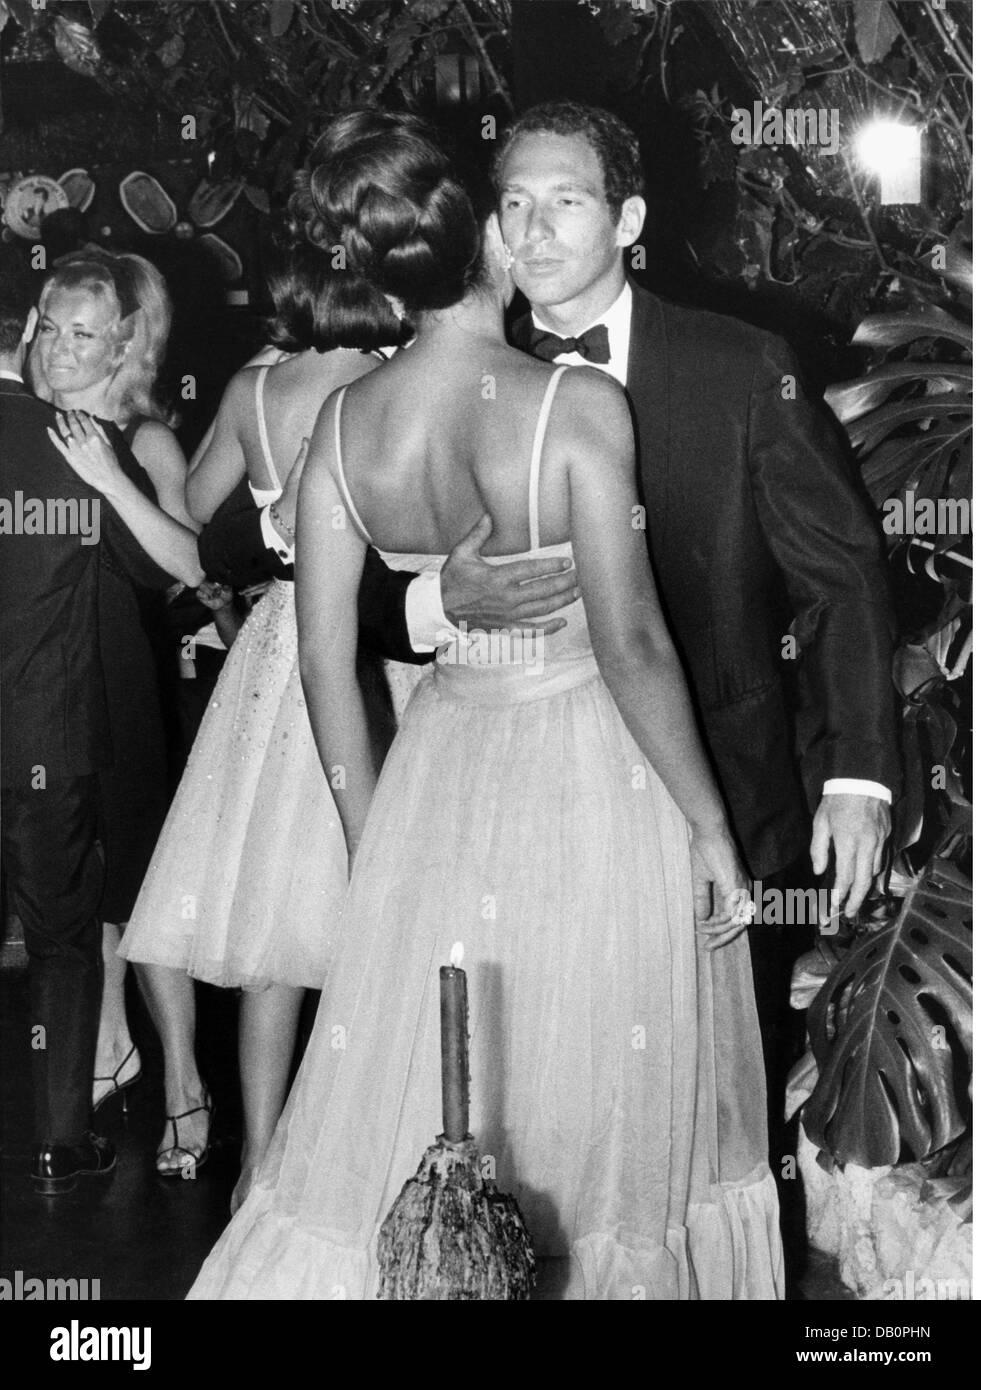 Fuerstenberg, Ira von, * 18.4.1940, German actress and jewellery designer, with Pierre de Olais in a nightspot, - Stock Image